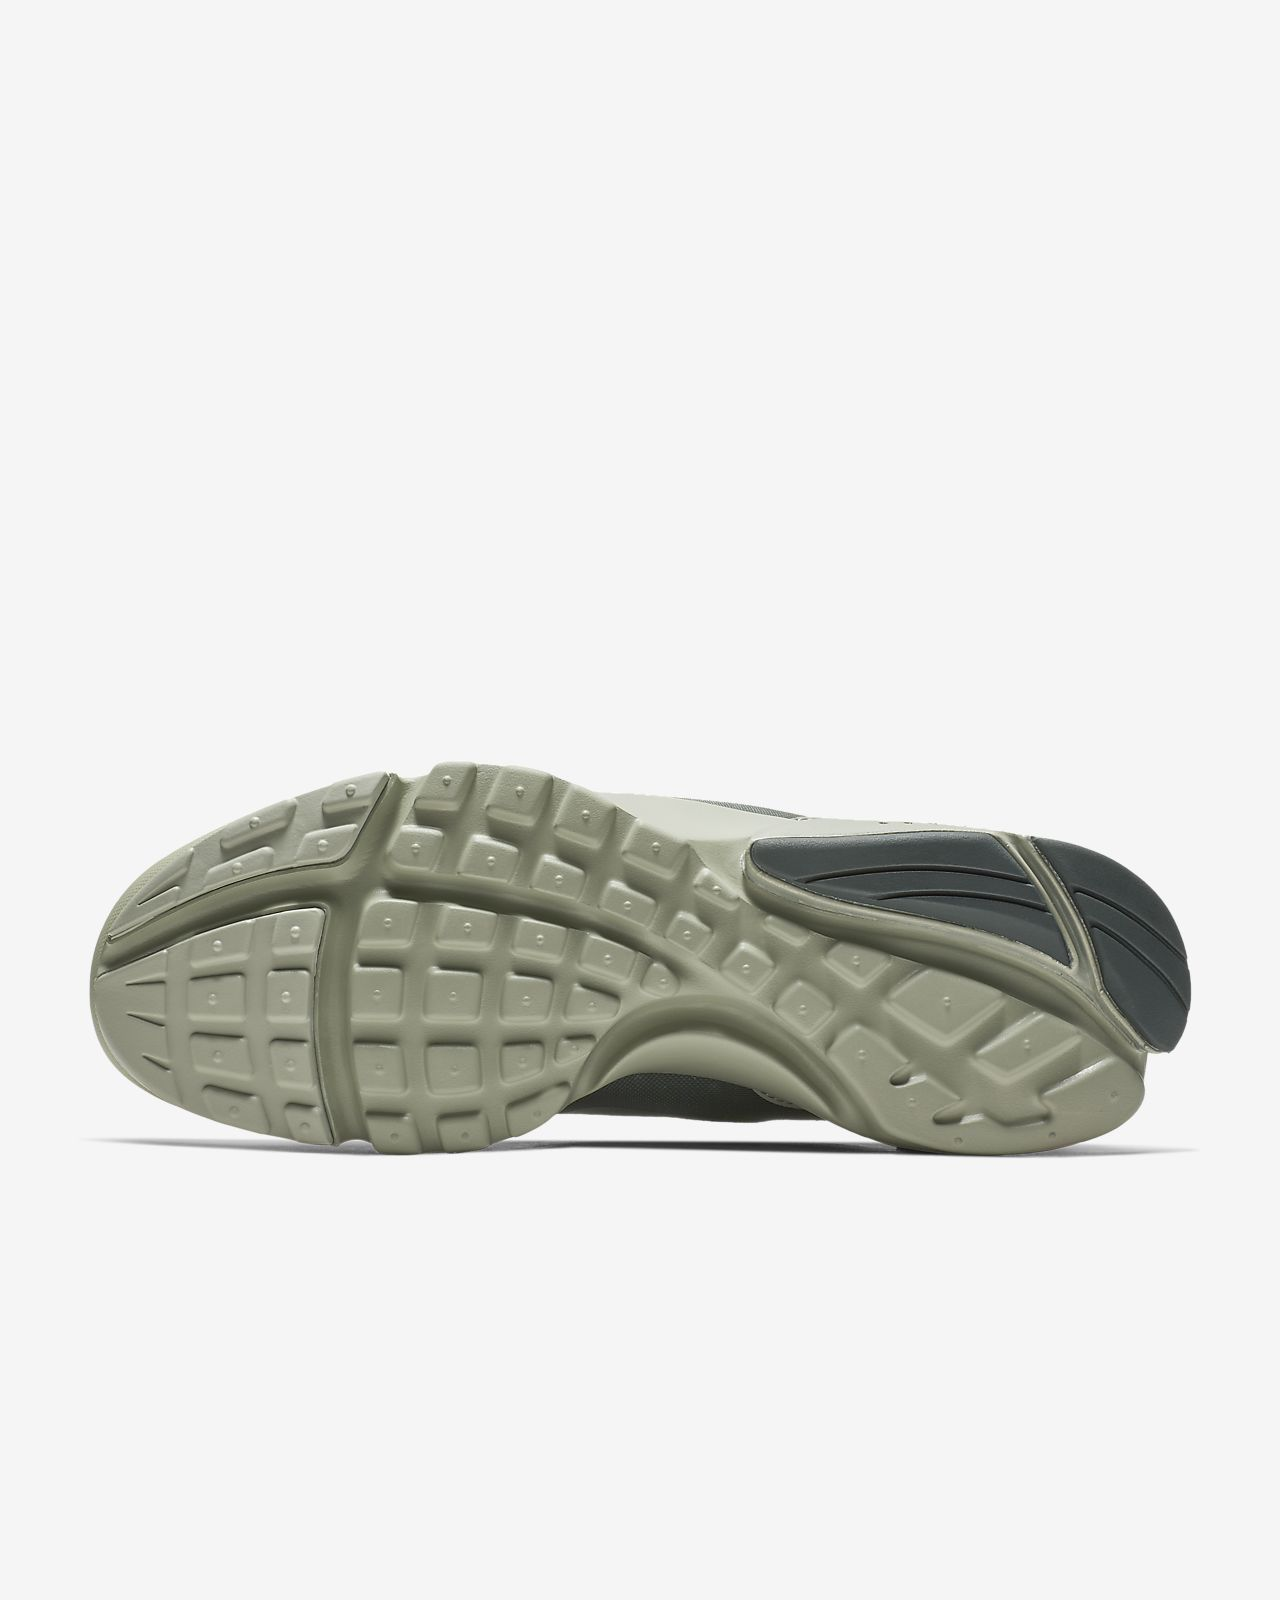 9b1ecd1f8c99 Nike Presto Fly World Men s Shoe. Nike.com GB